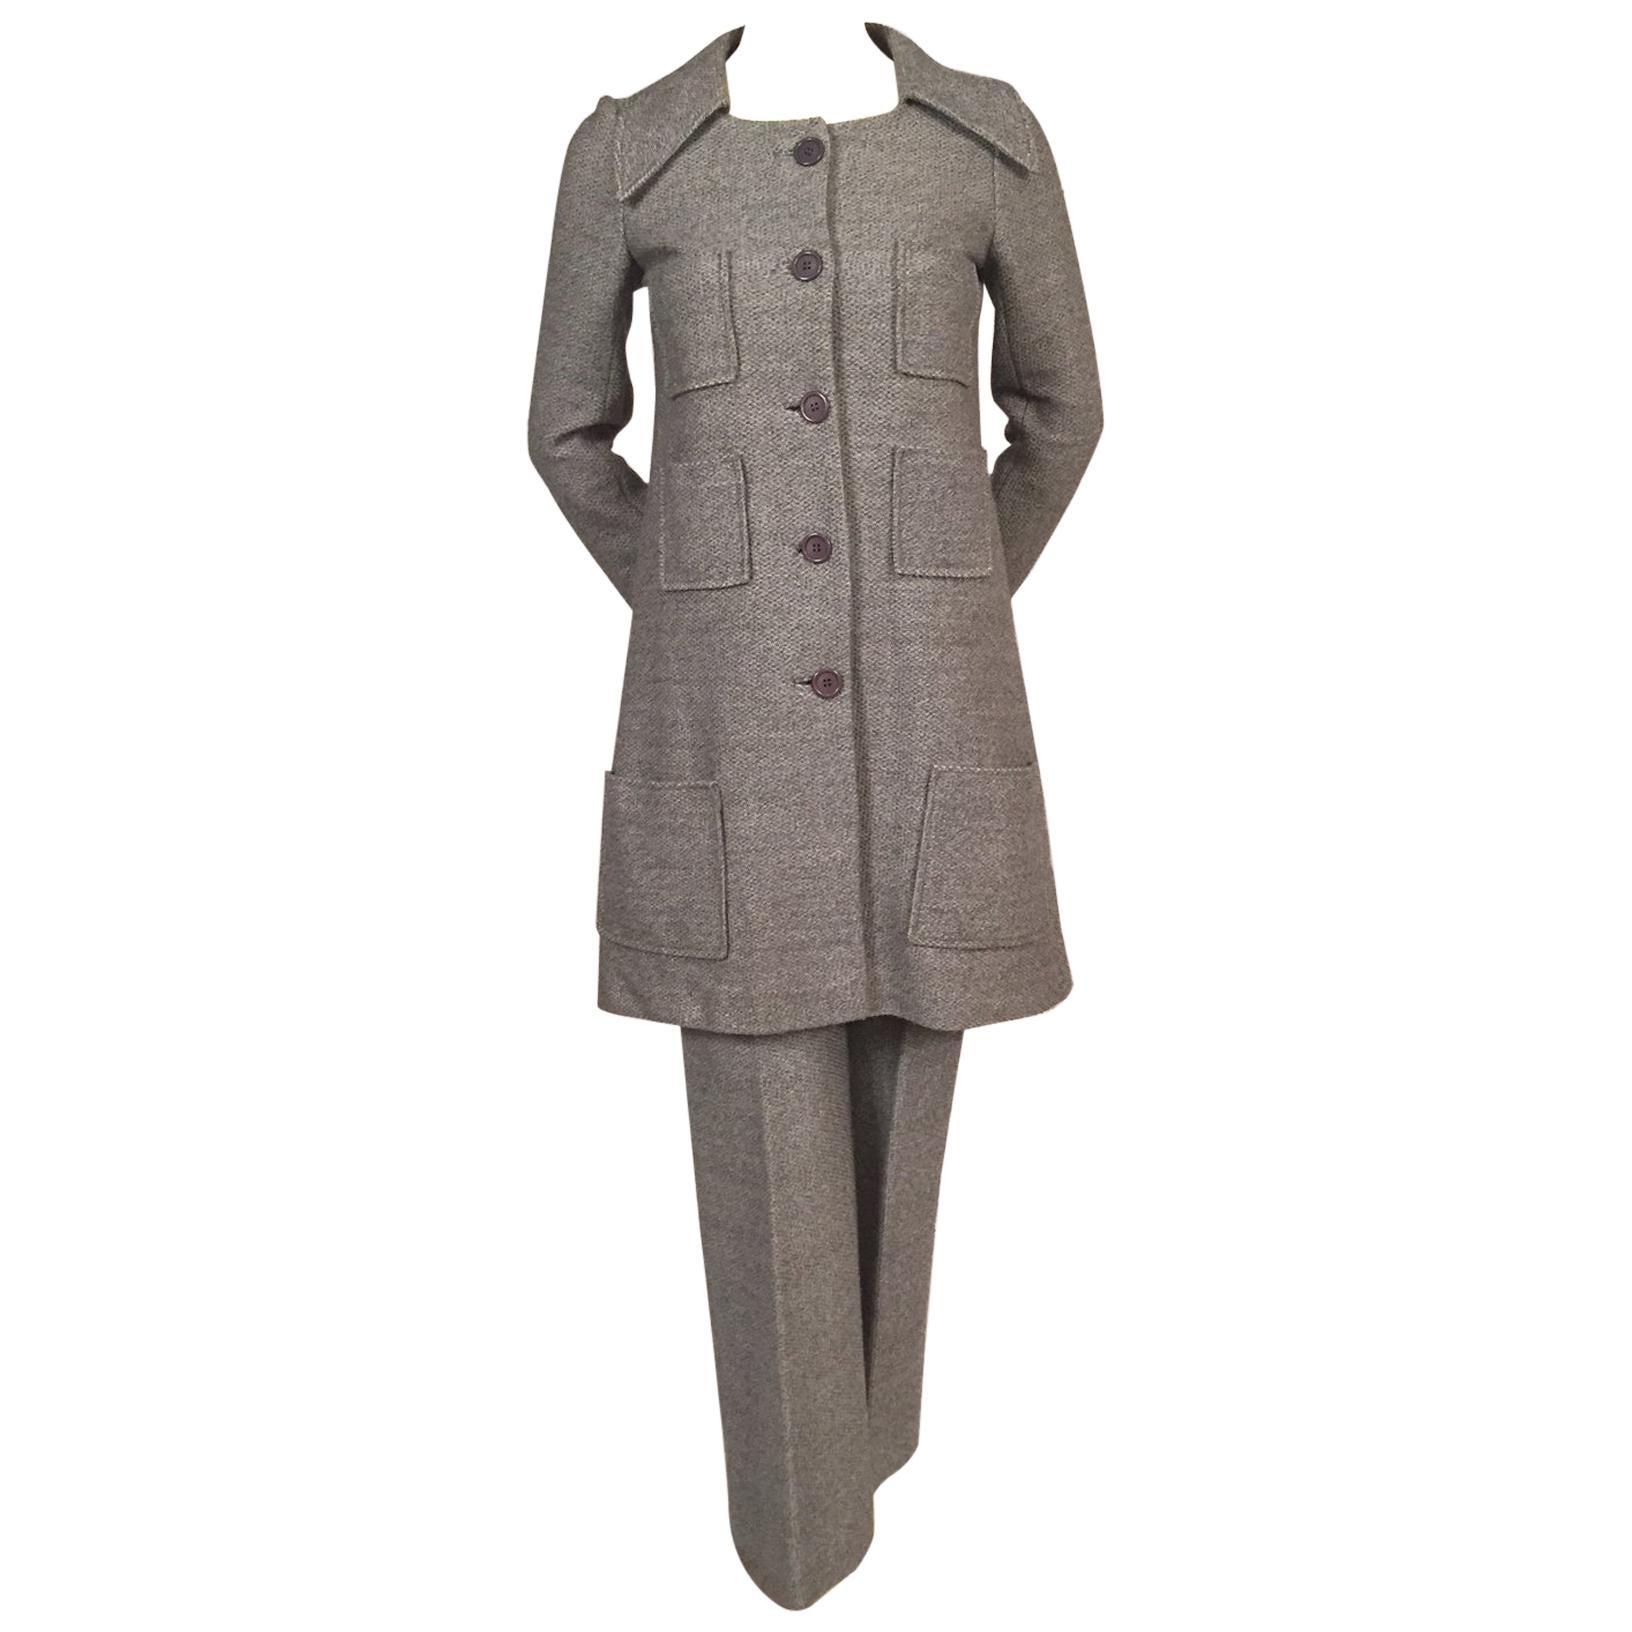 1970's Sonia Rykiel Wool Tweed Six Pocket Coat and Matching Trousers